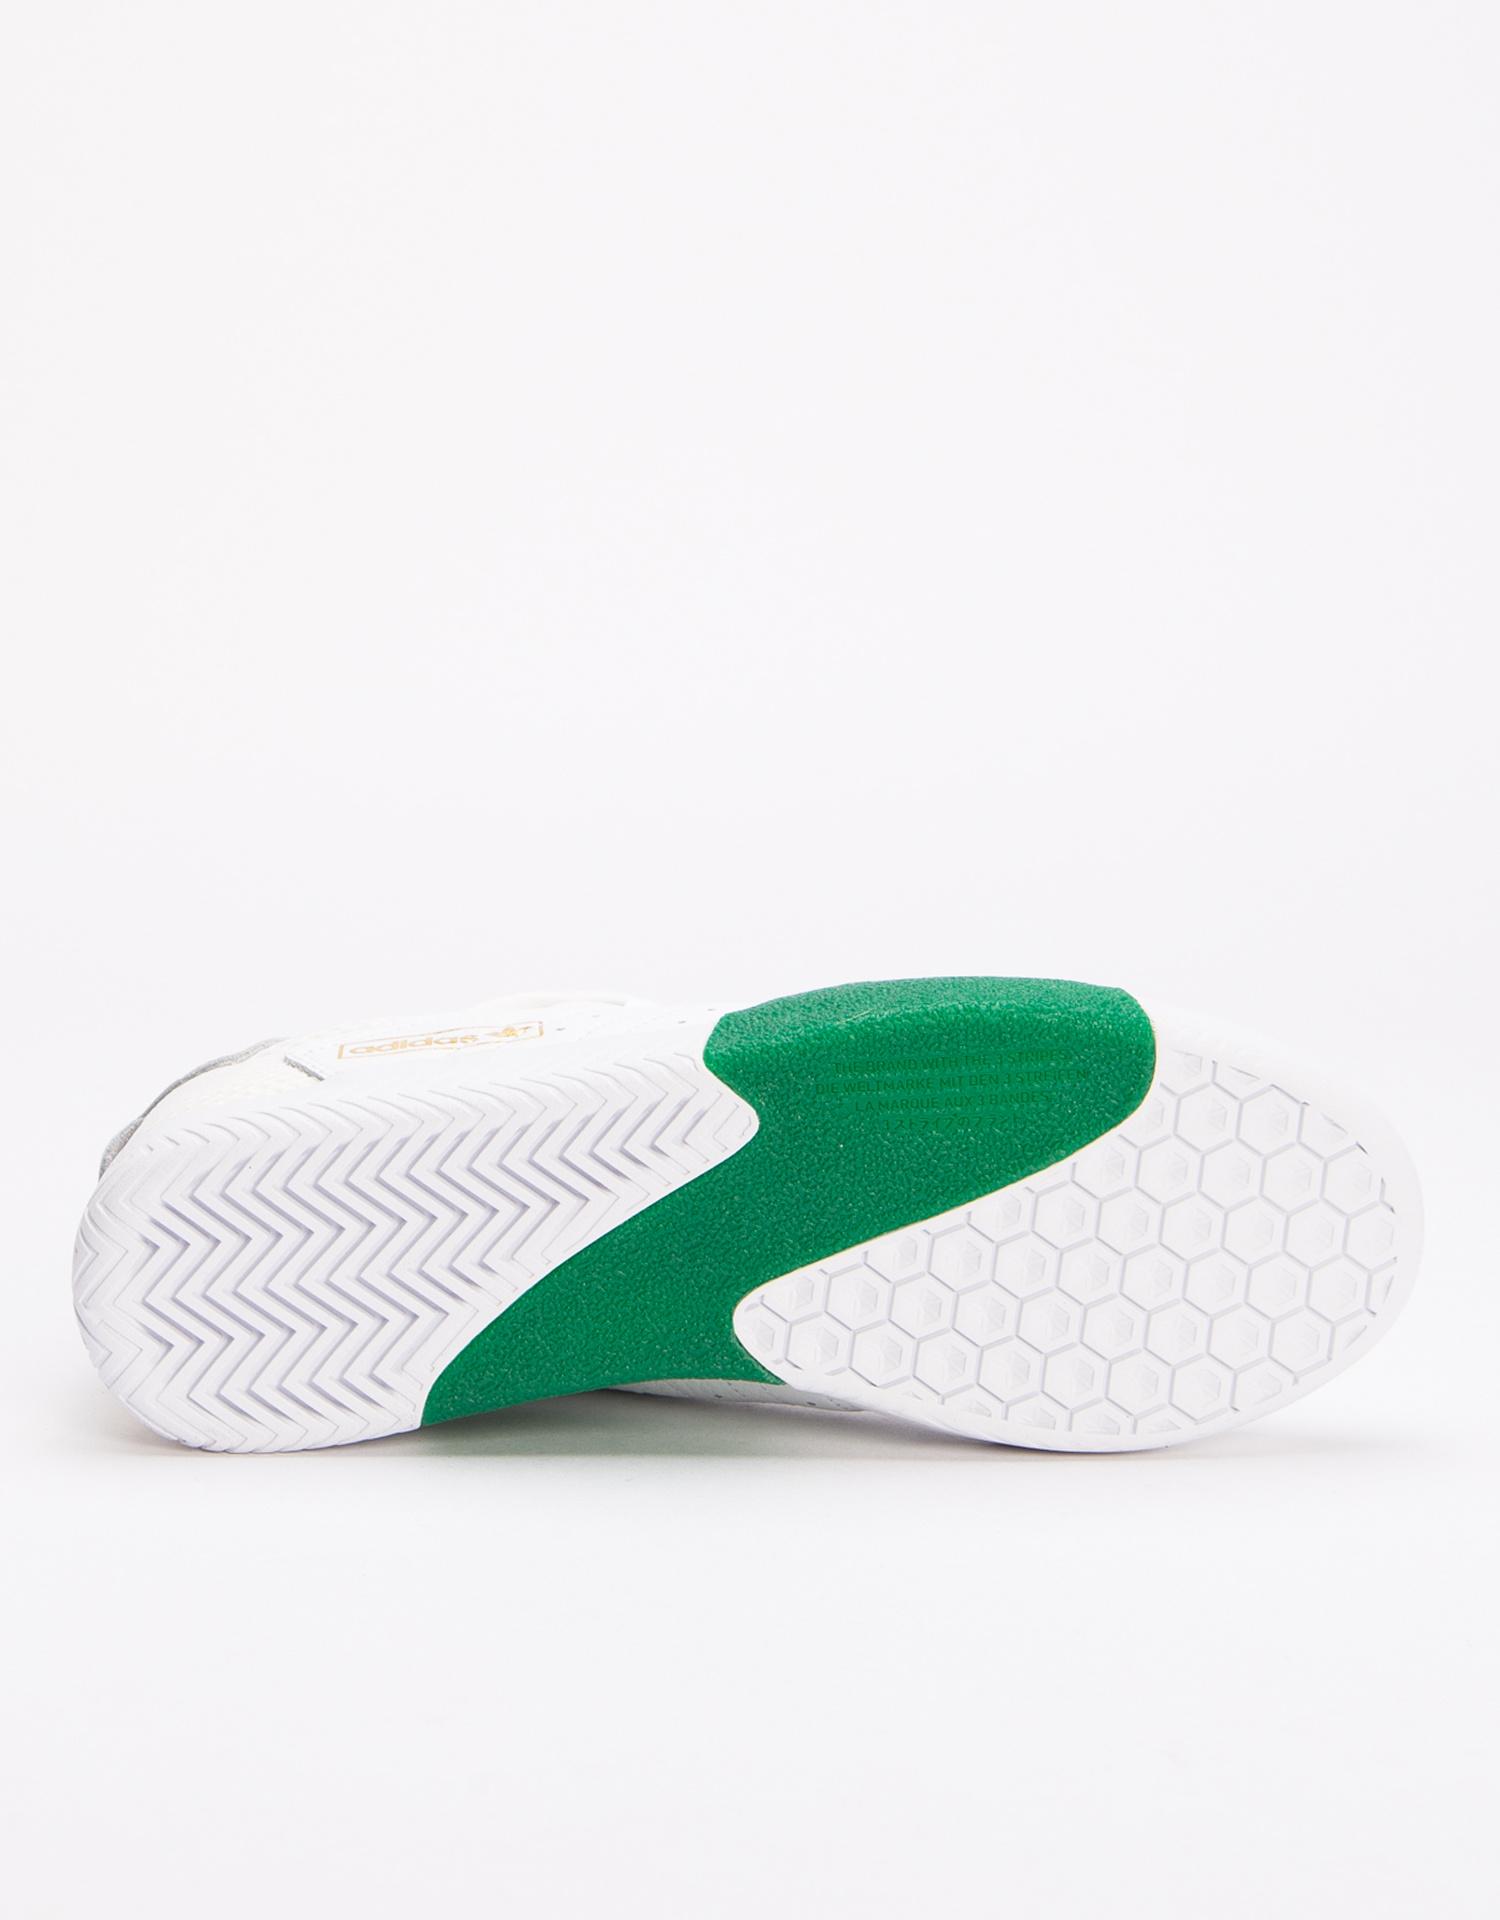 Adidas 3st.003             ftwwht/bgreen/bogold